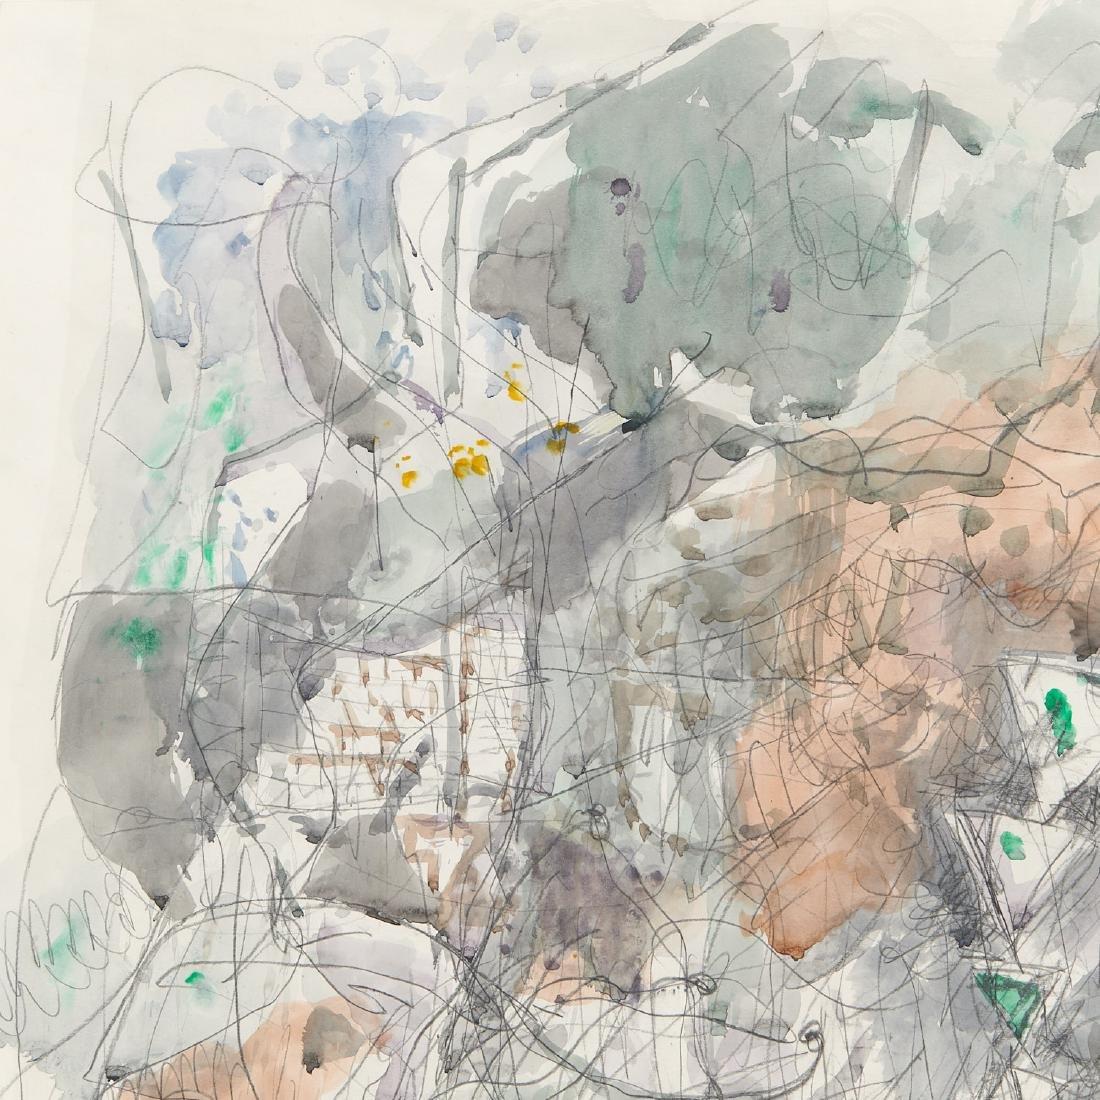 Avigdor Stematzky, Abstract Landscape, 1980 - 3